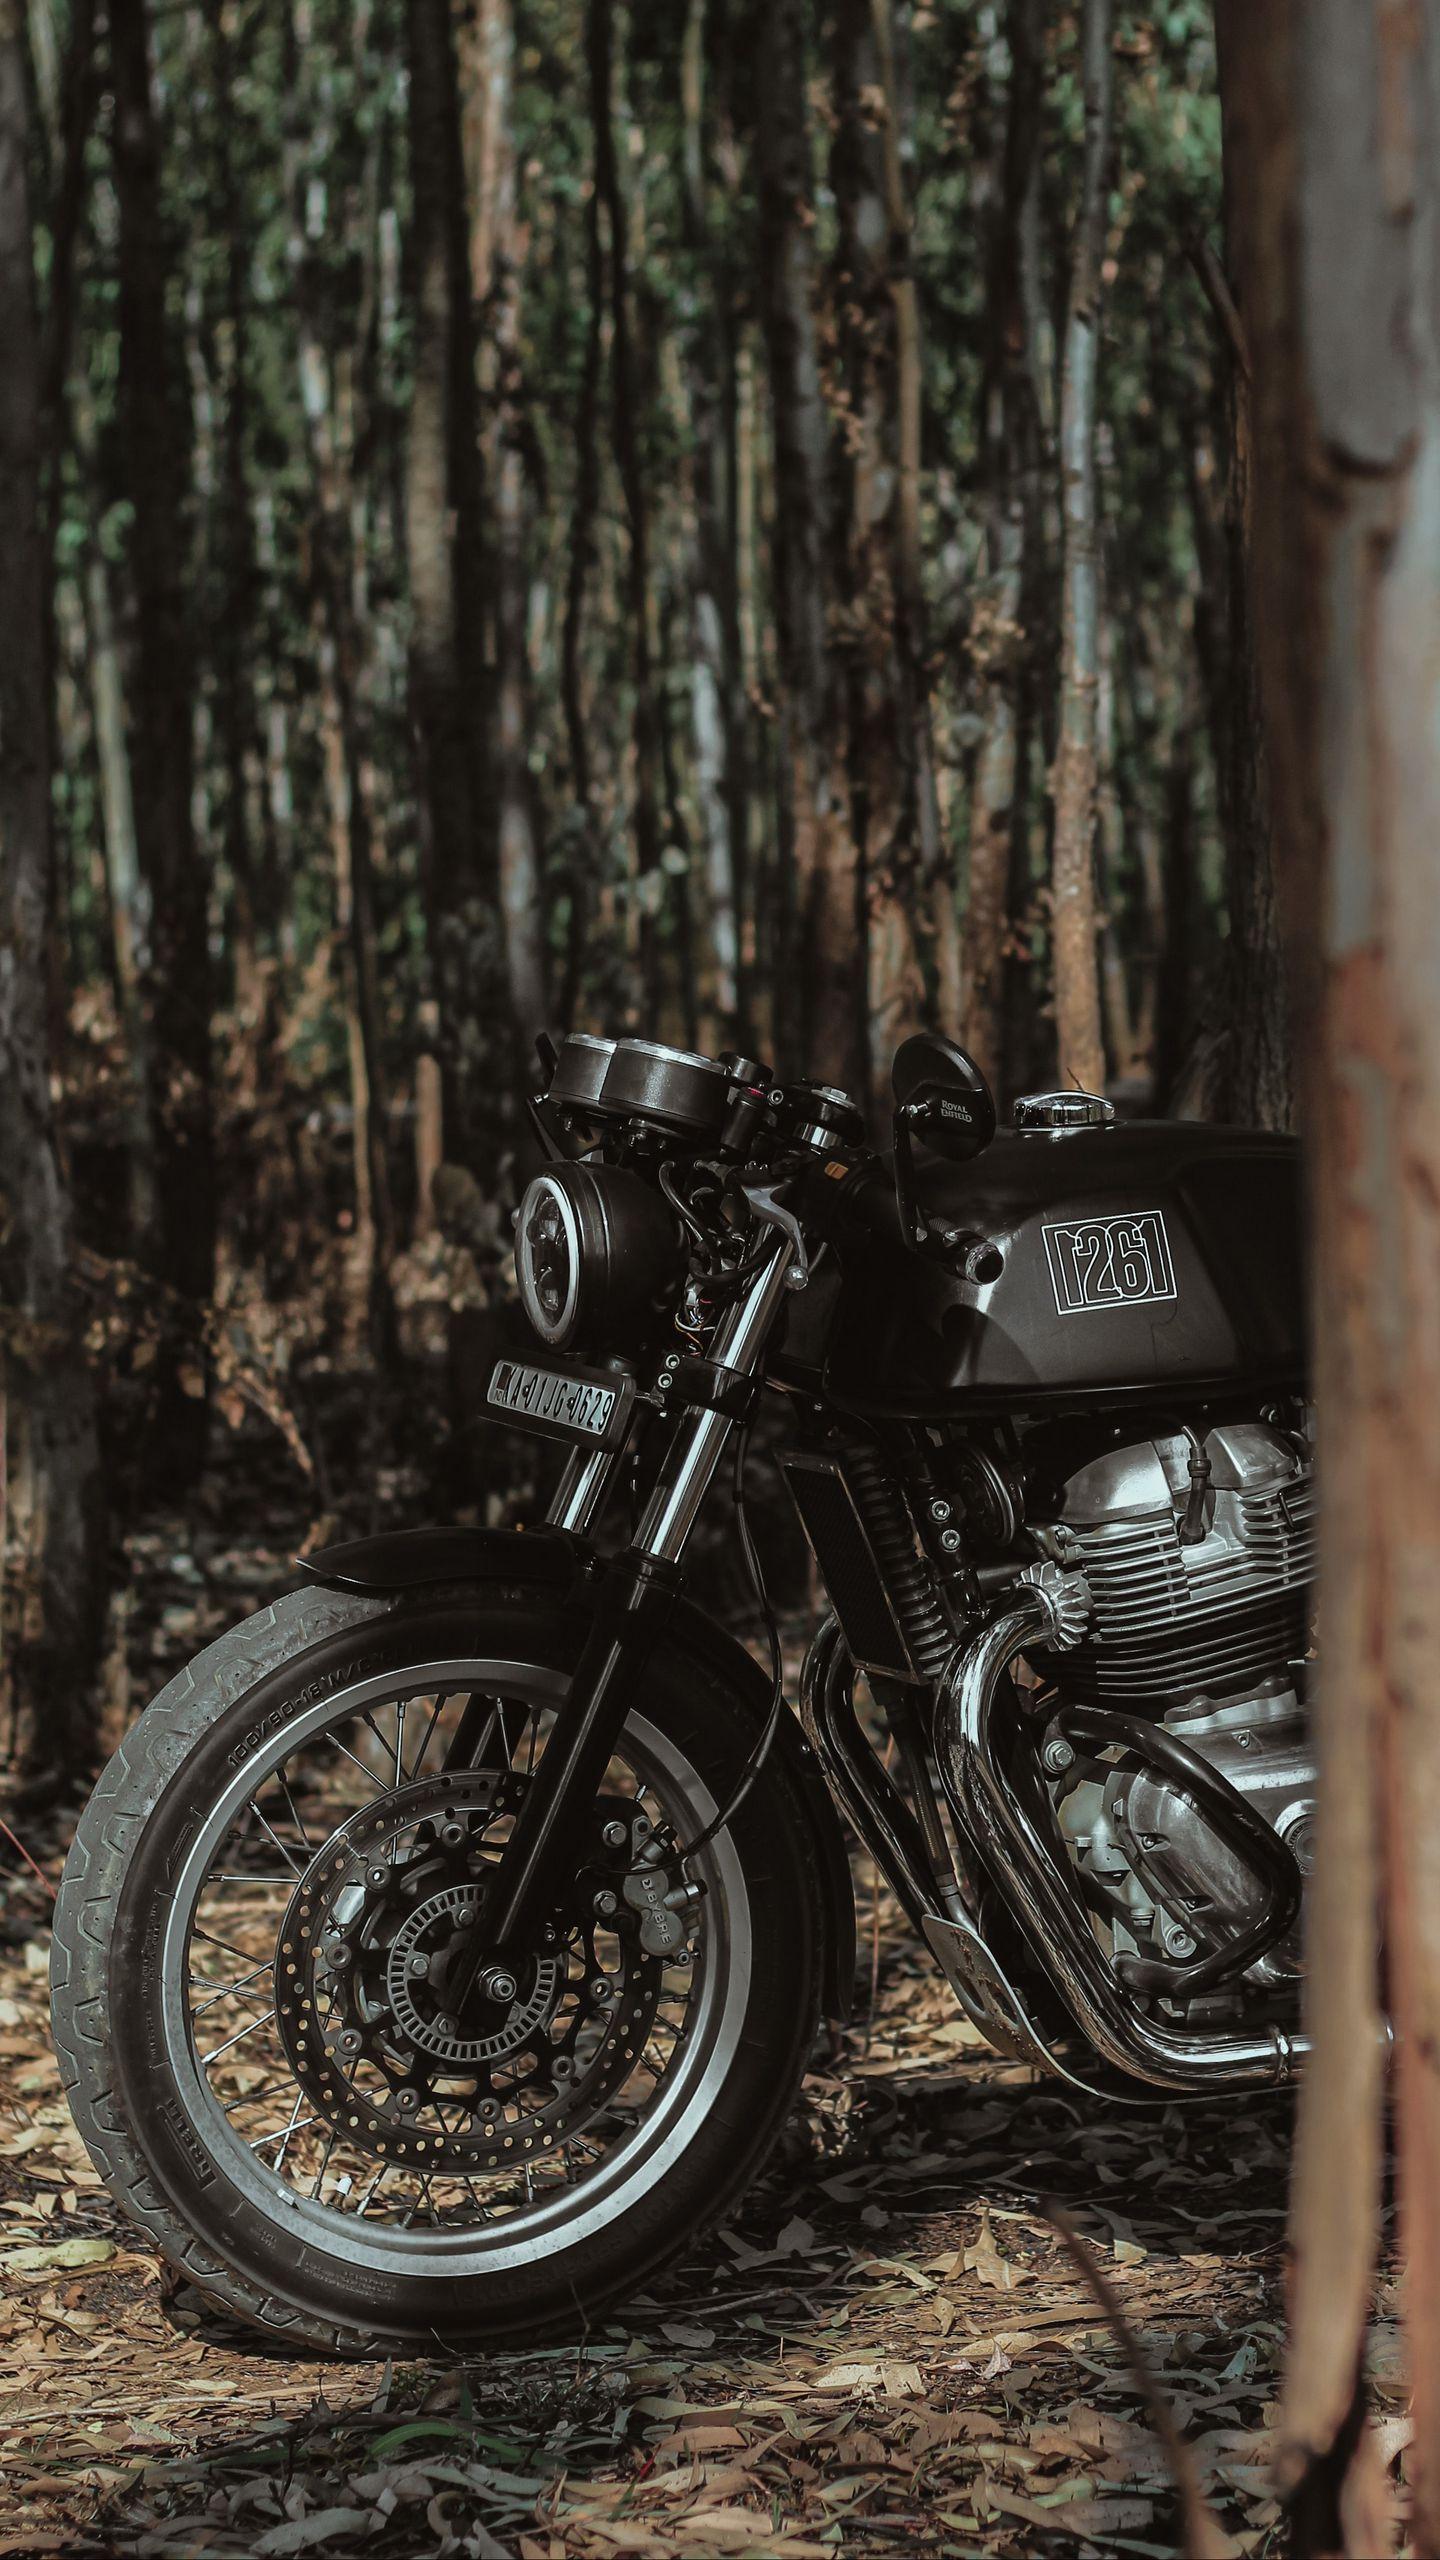 1440x2560 Wallpaper royal enfield, motorcycle, bike, black, forest